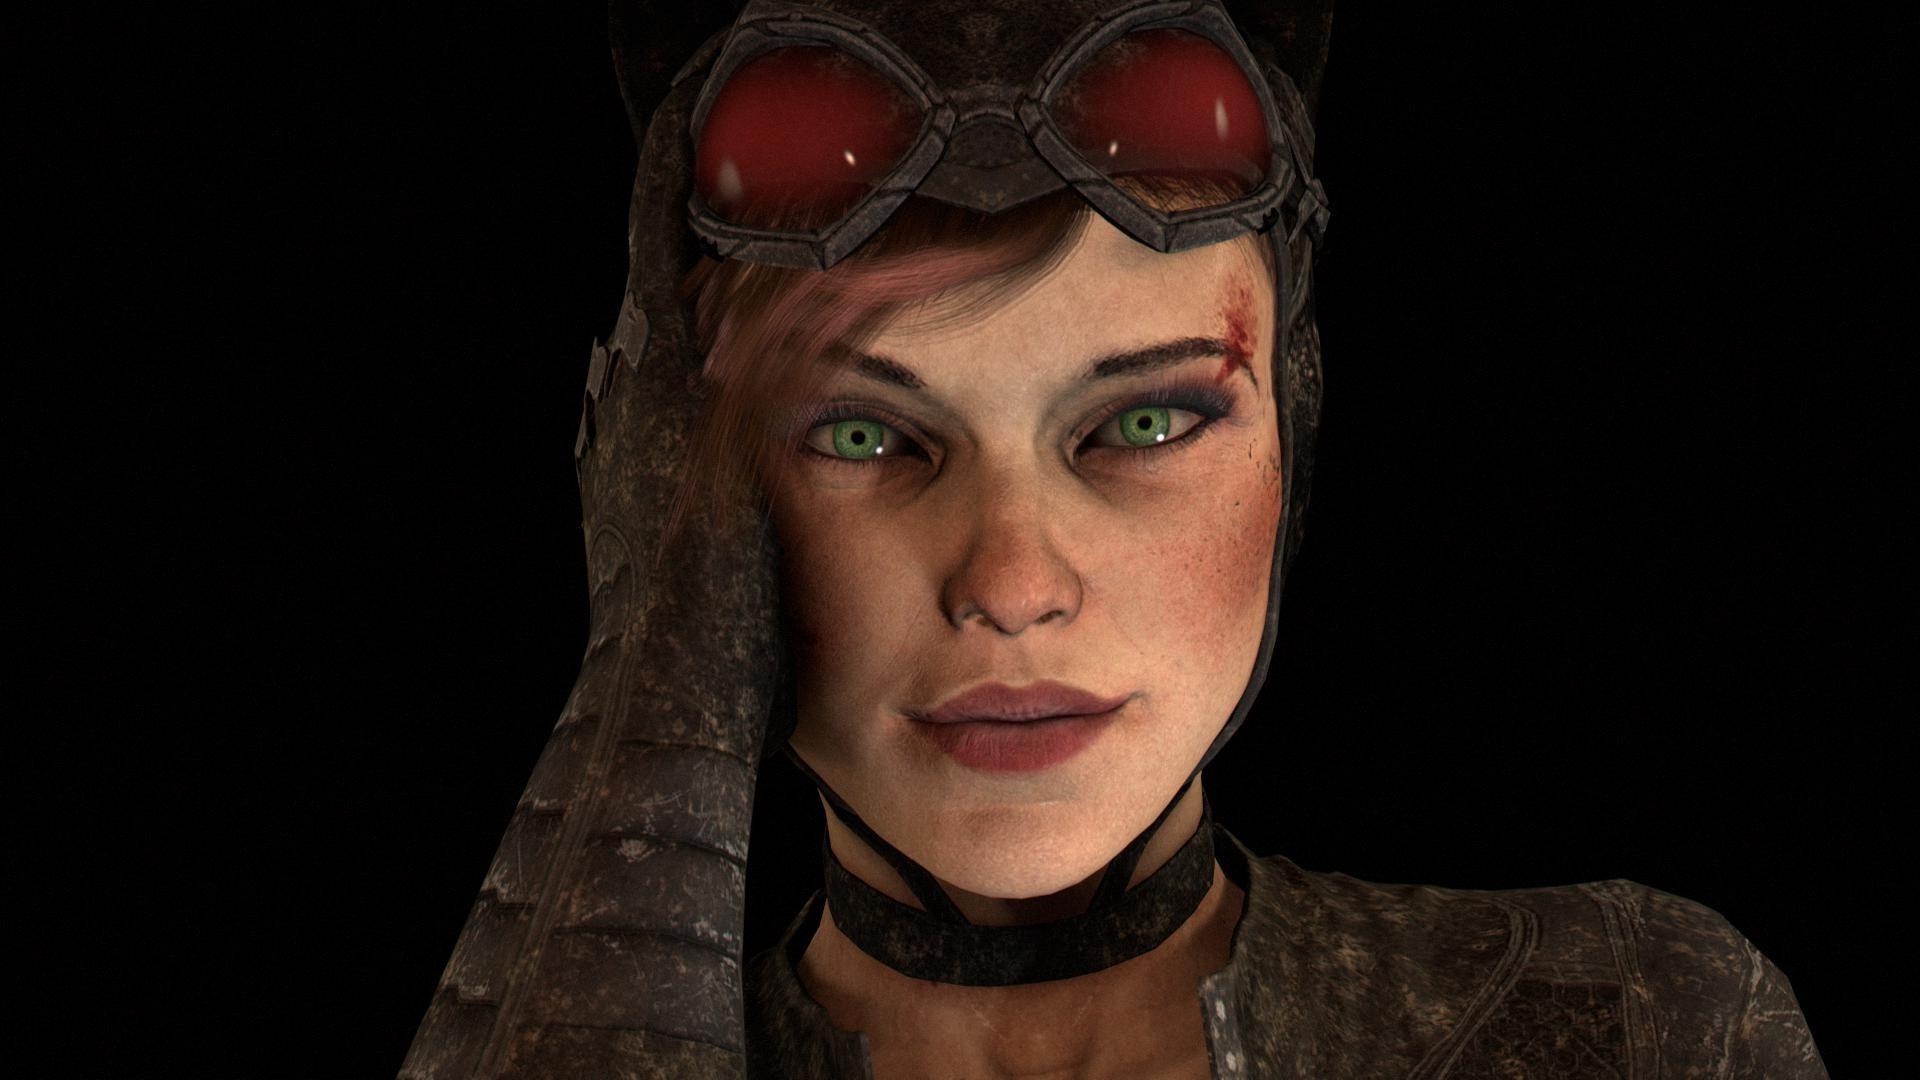 1920x1080 Px Batman Arkham Knight Catwoman Video Games